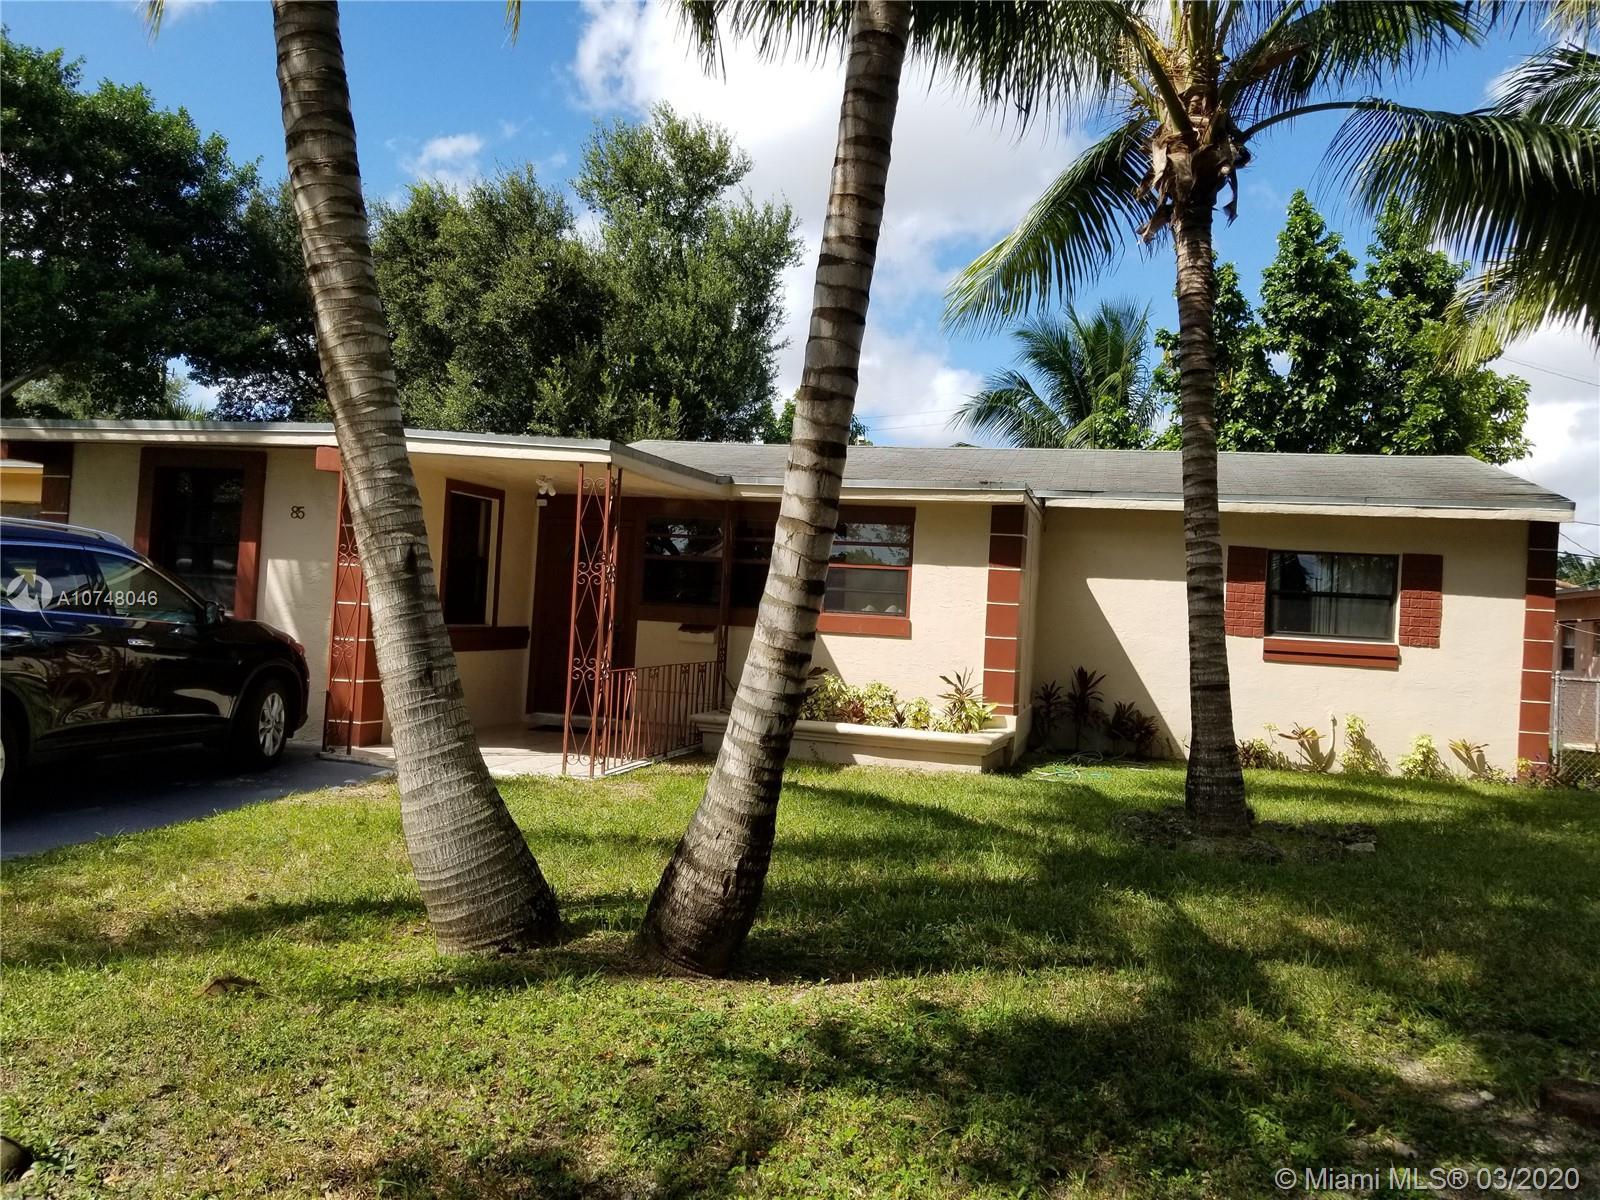 85 NE 171, North Miami Beach, FL 33162 - North Miami Beach, FL real estate listing